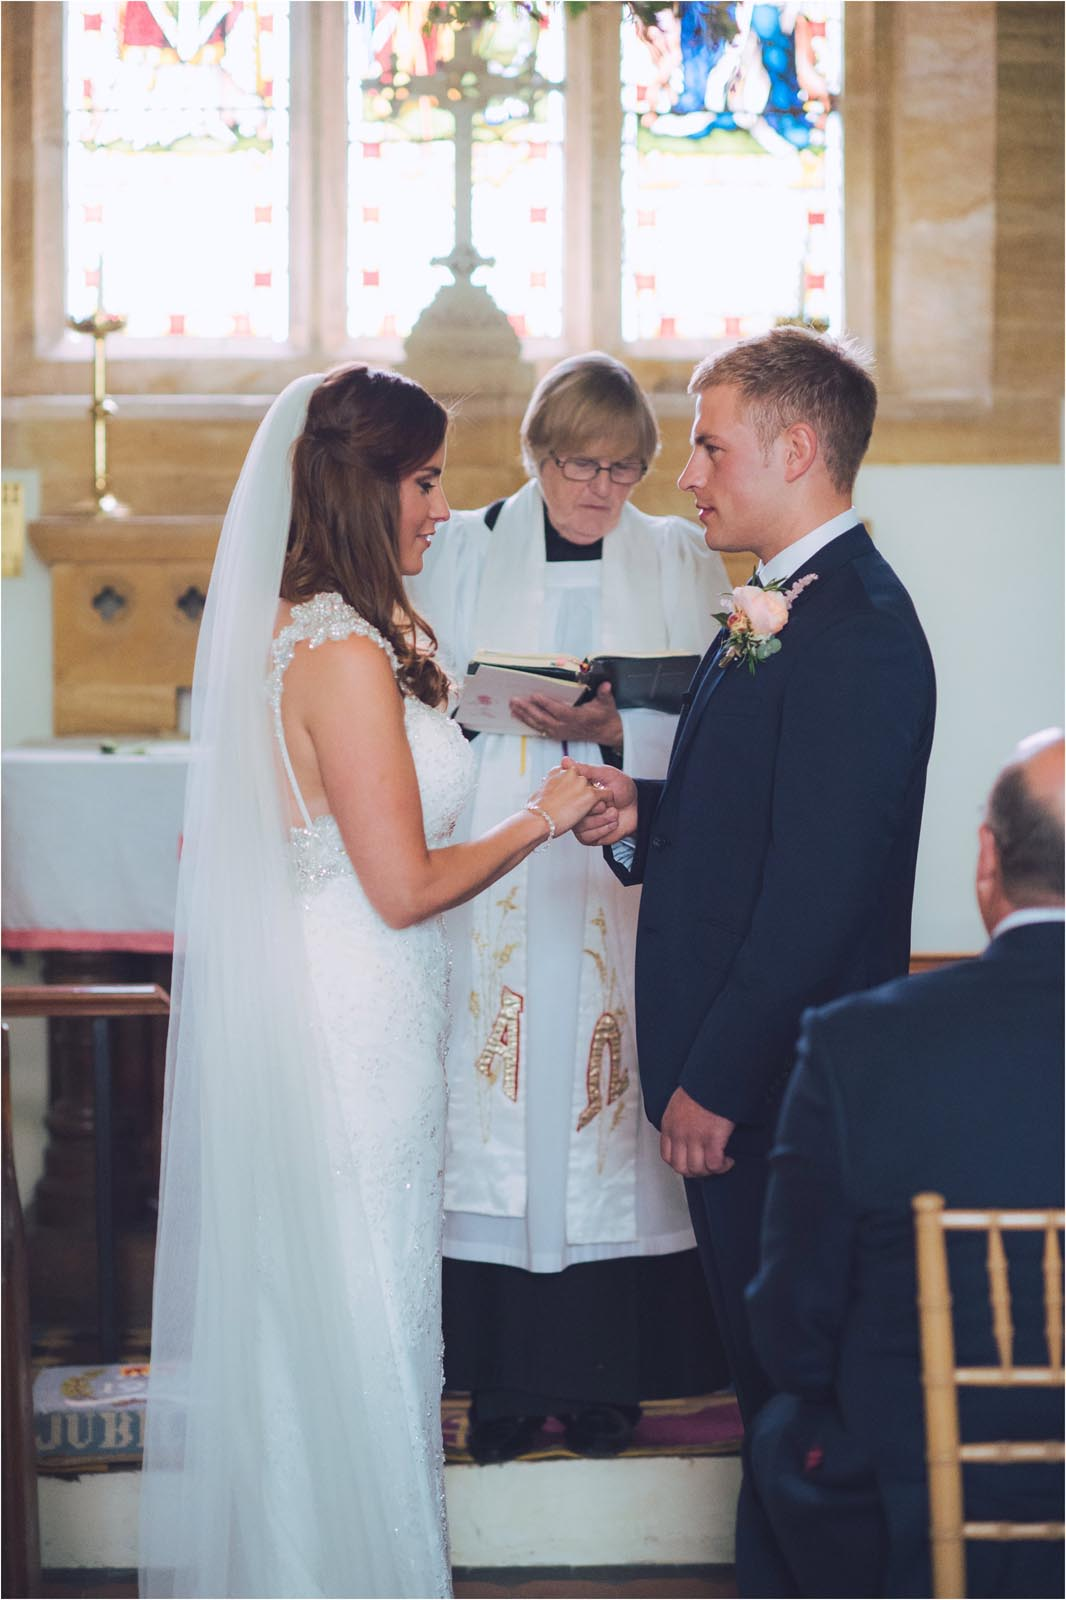 Simon biffen wedding photography 0065